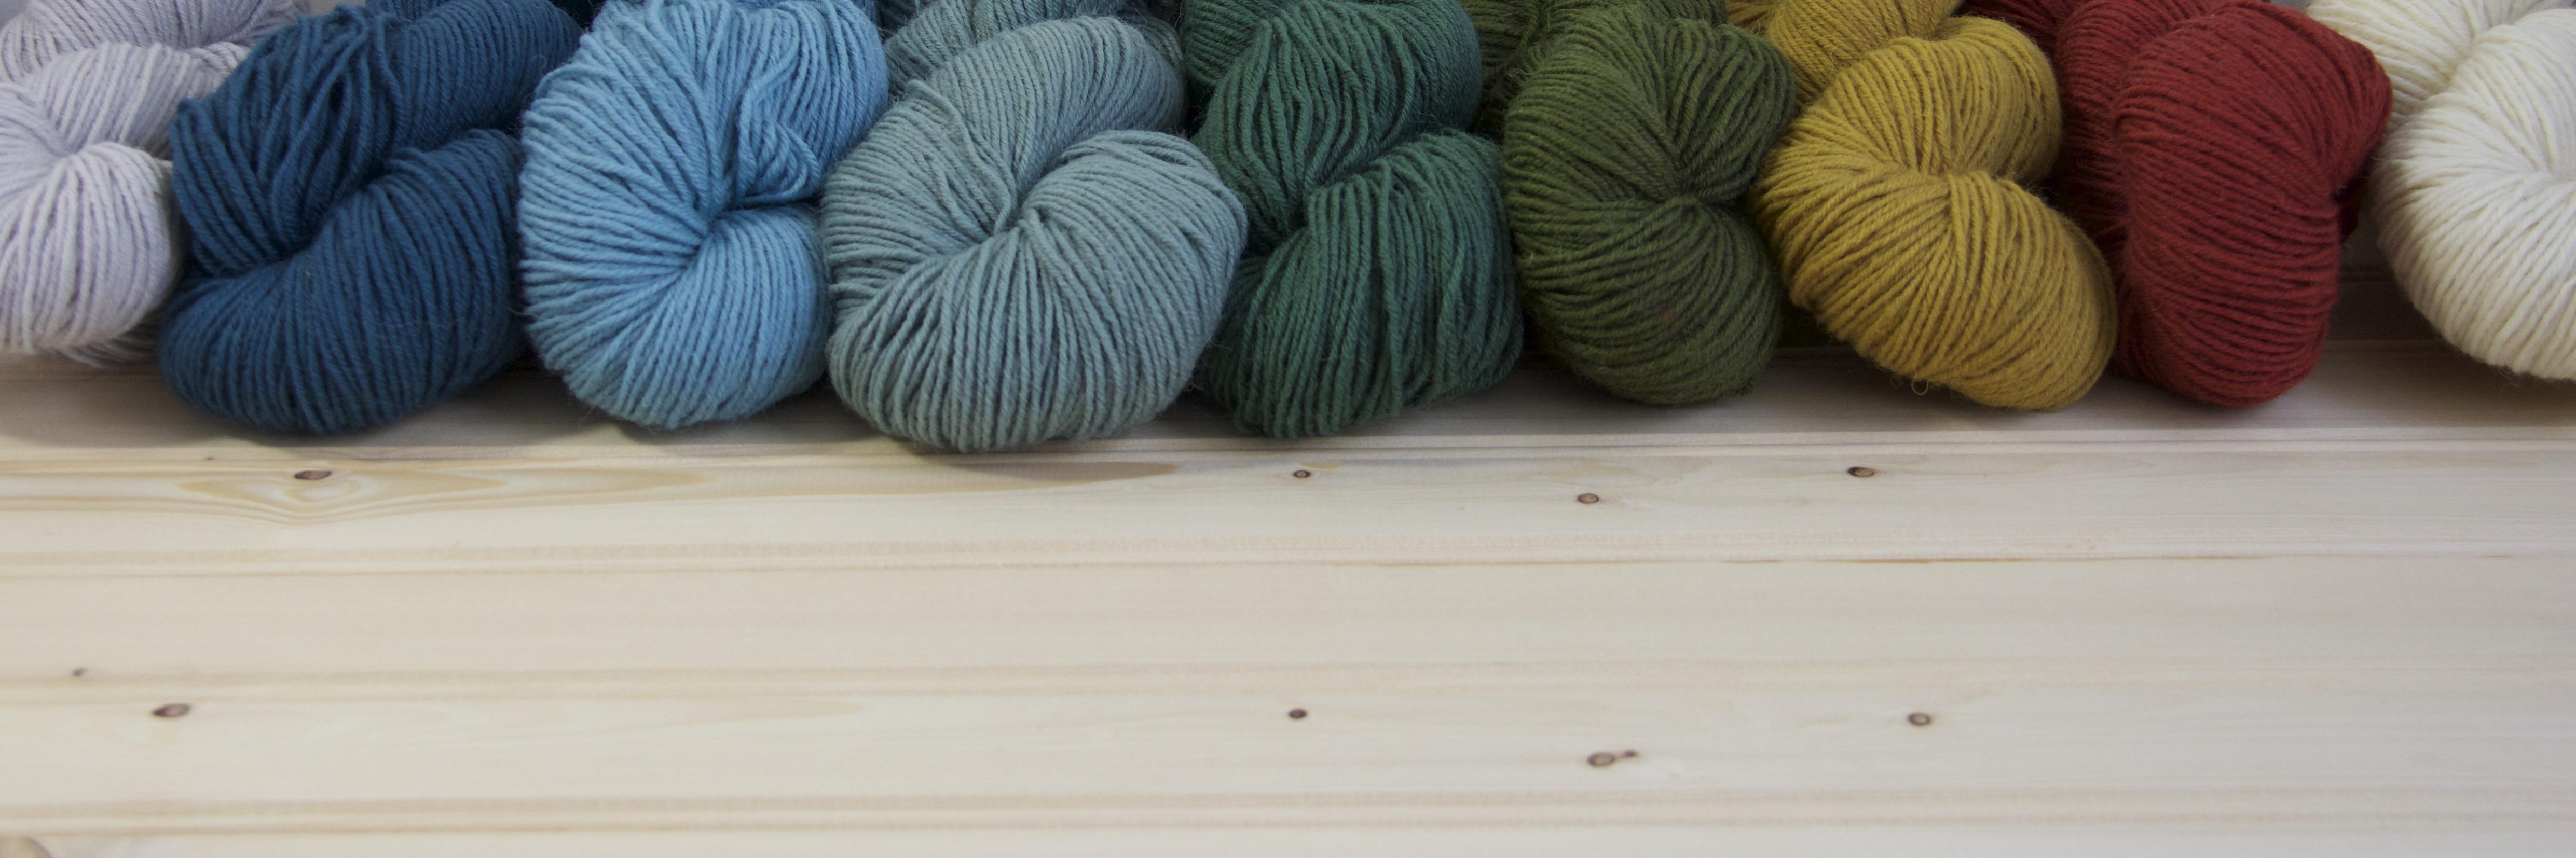 At Sea: Guernsey, Gansey & Arans - Cornwall Yarn Shop, Ltd.